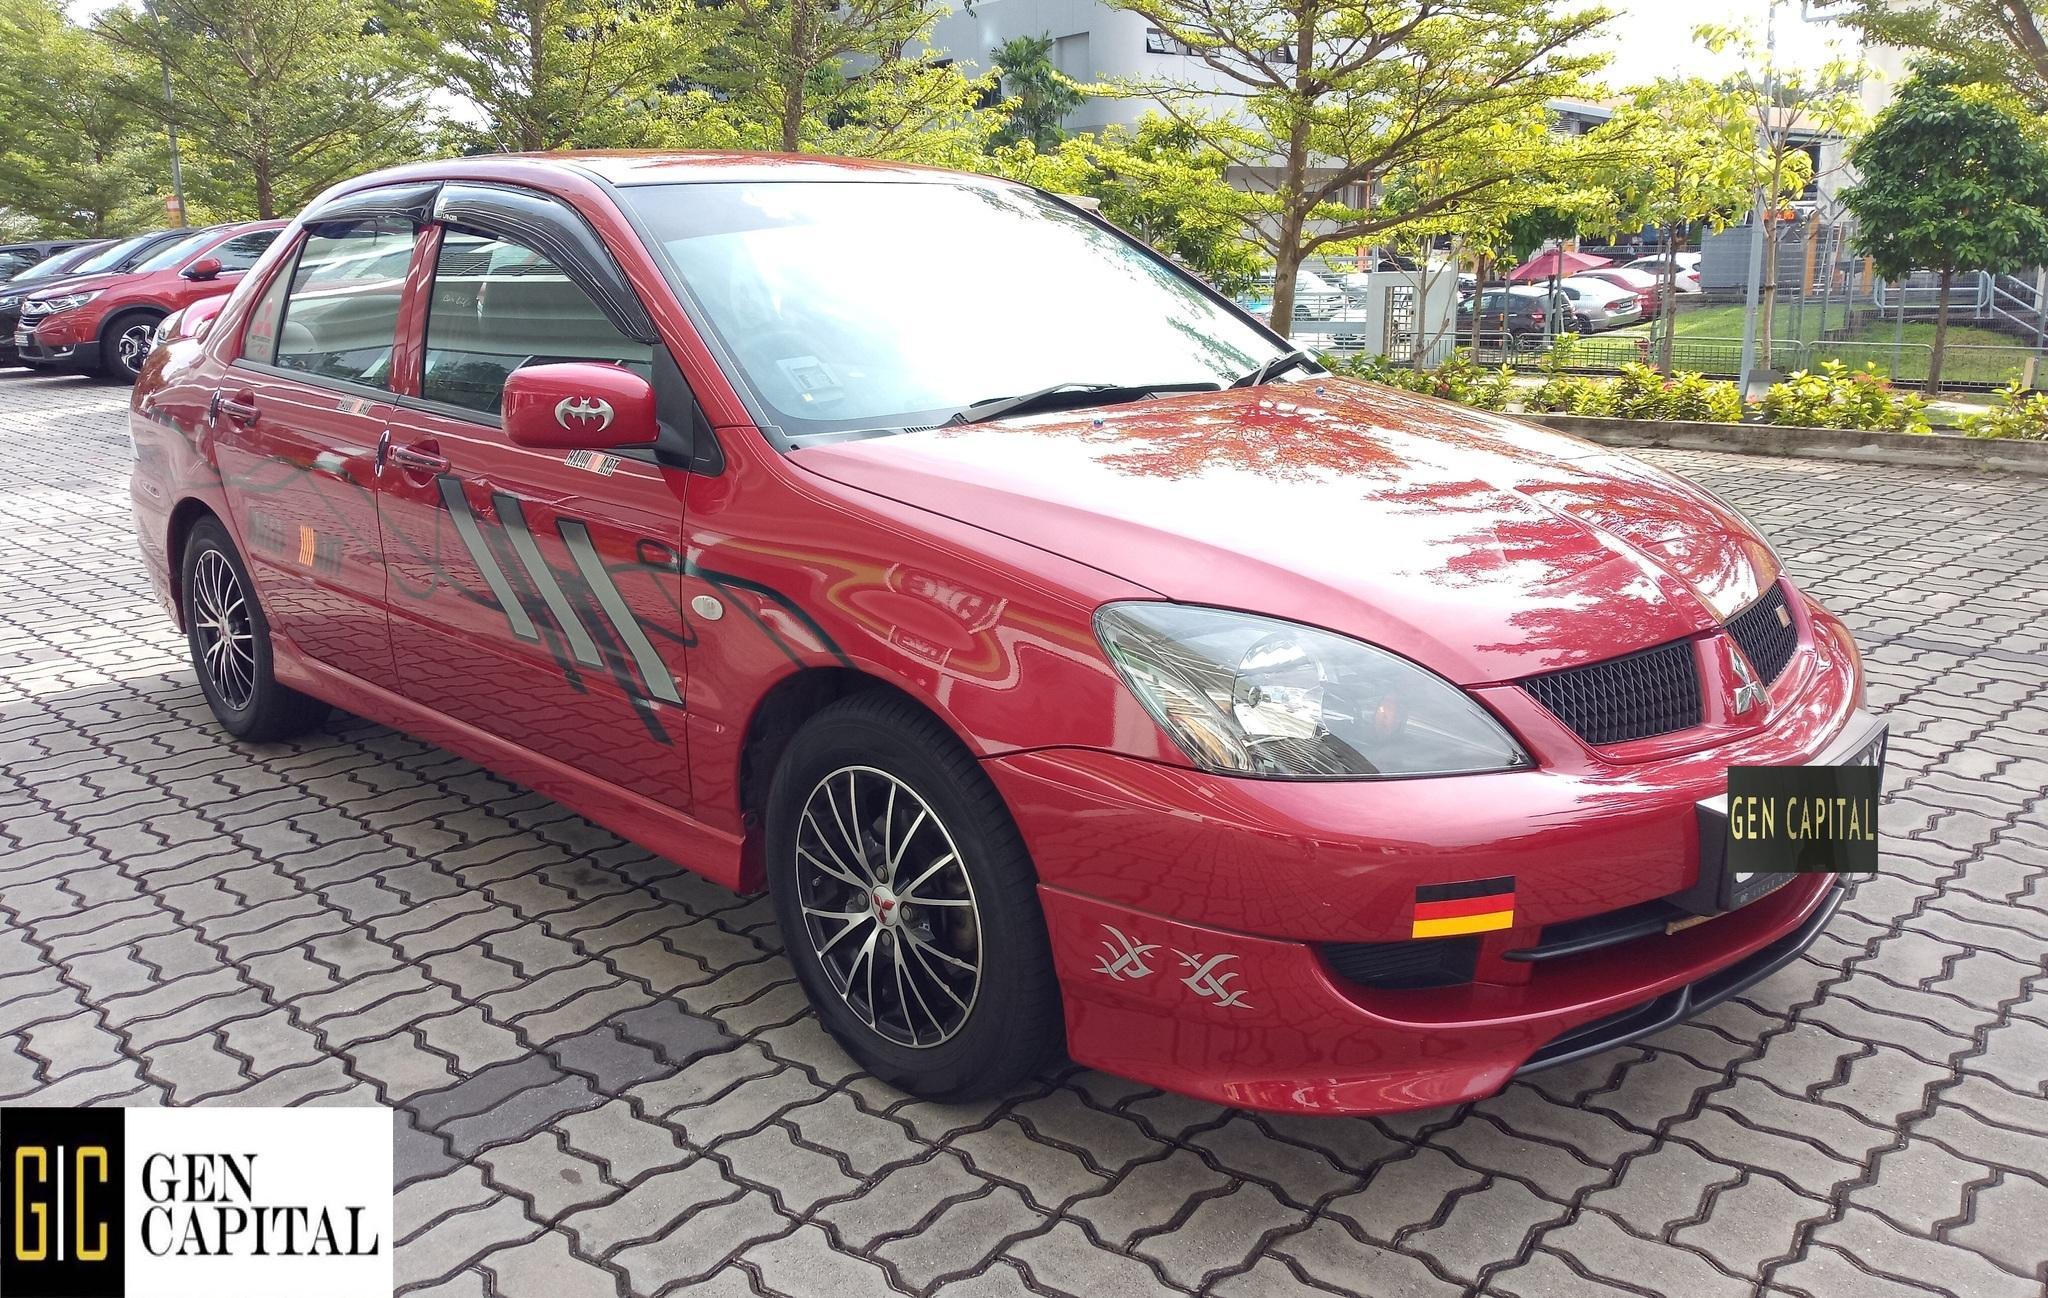 Mitsubishi LANCER 1.6A GLX Short Term or Long Term Rental Car Service (Promotional Rate)